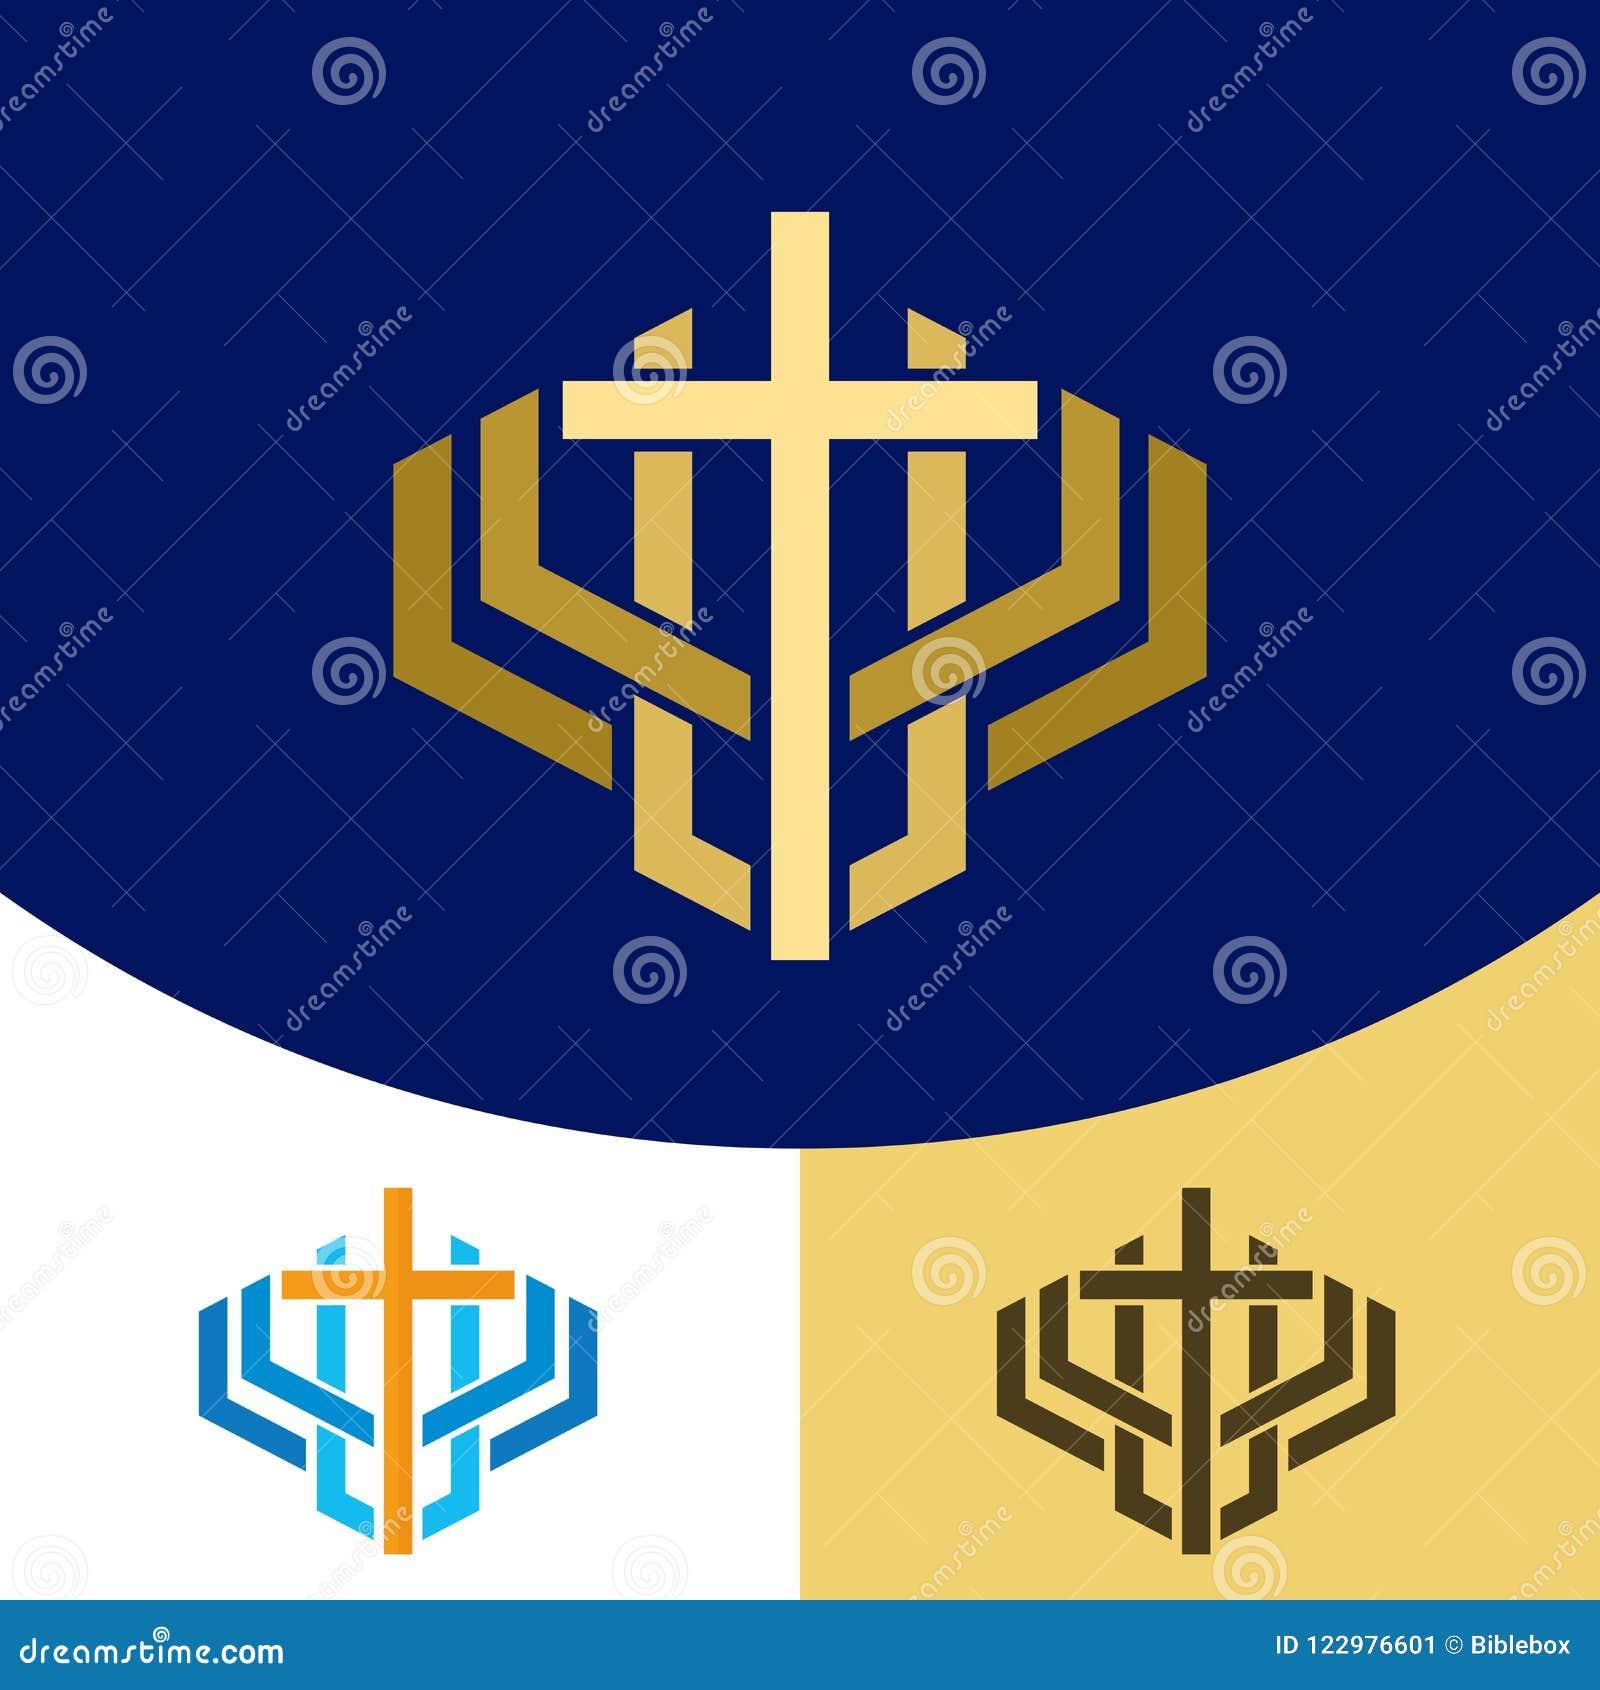 Church Logo Christian Symbols The Cross Of Jesus Christ A Symbol